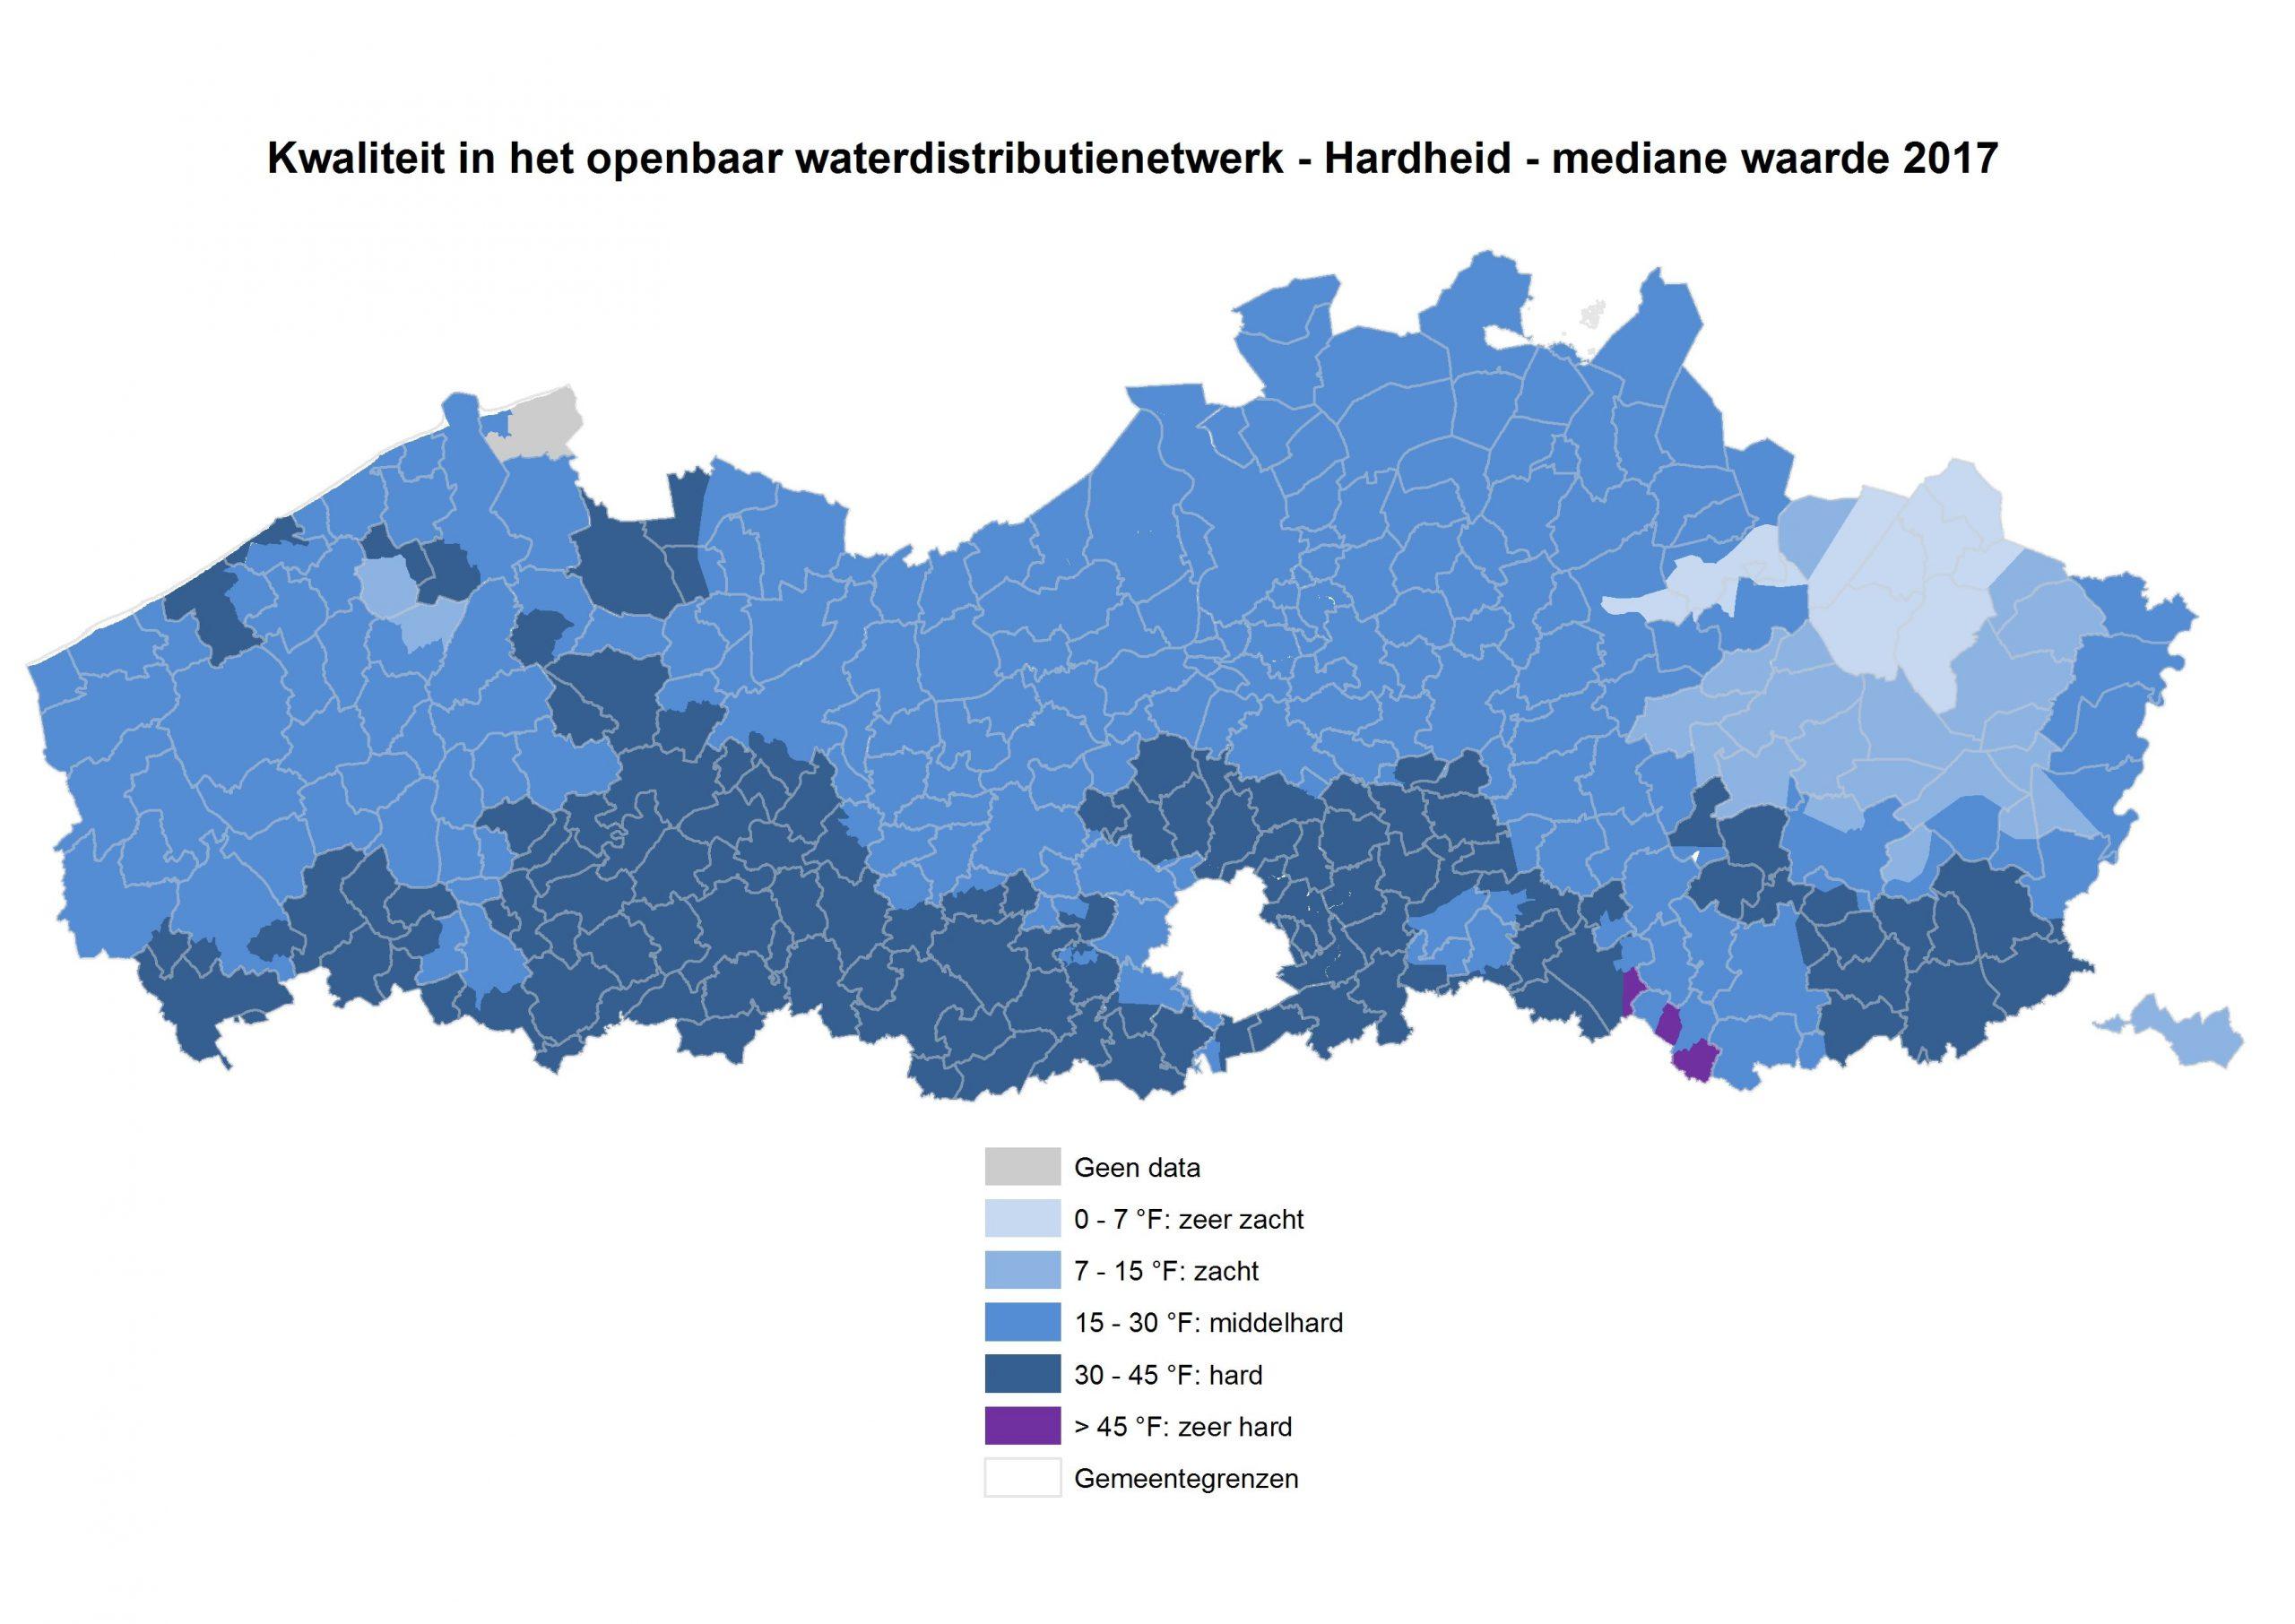 kaartweergave waterhardheid Vlaanderen